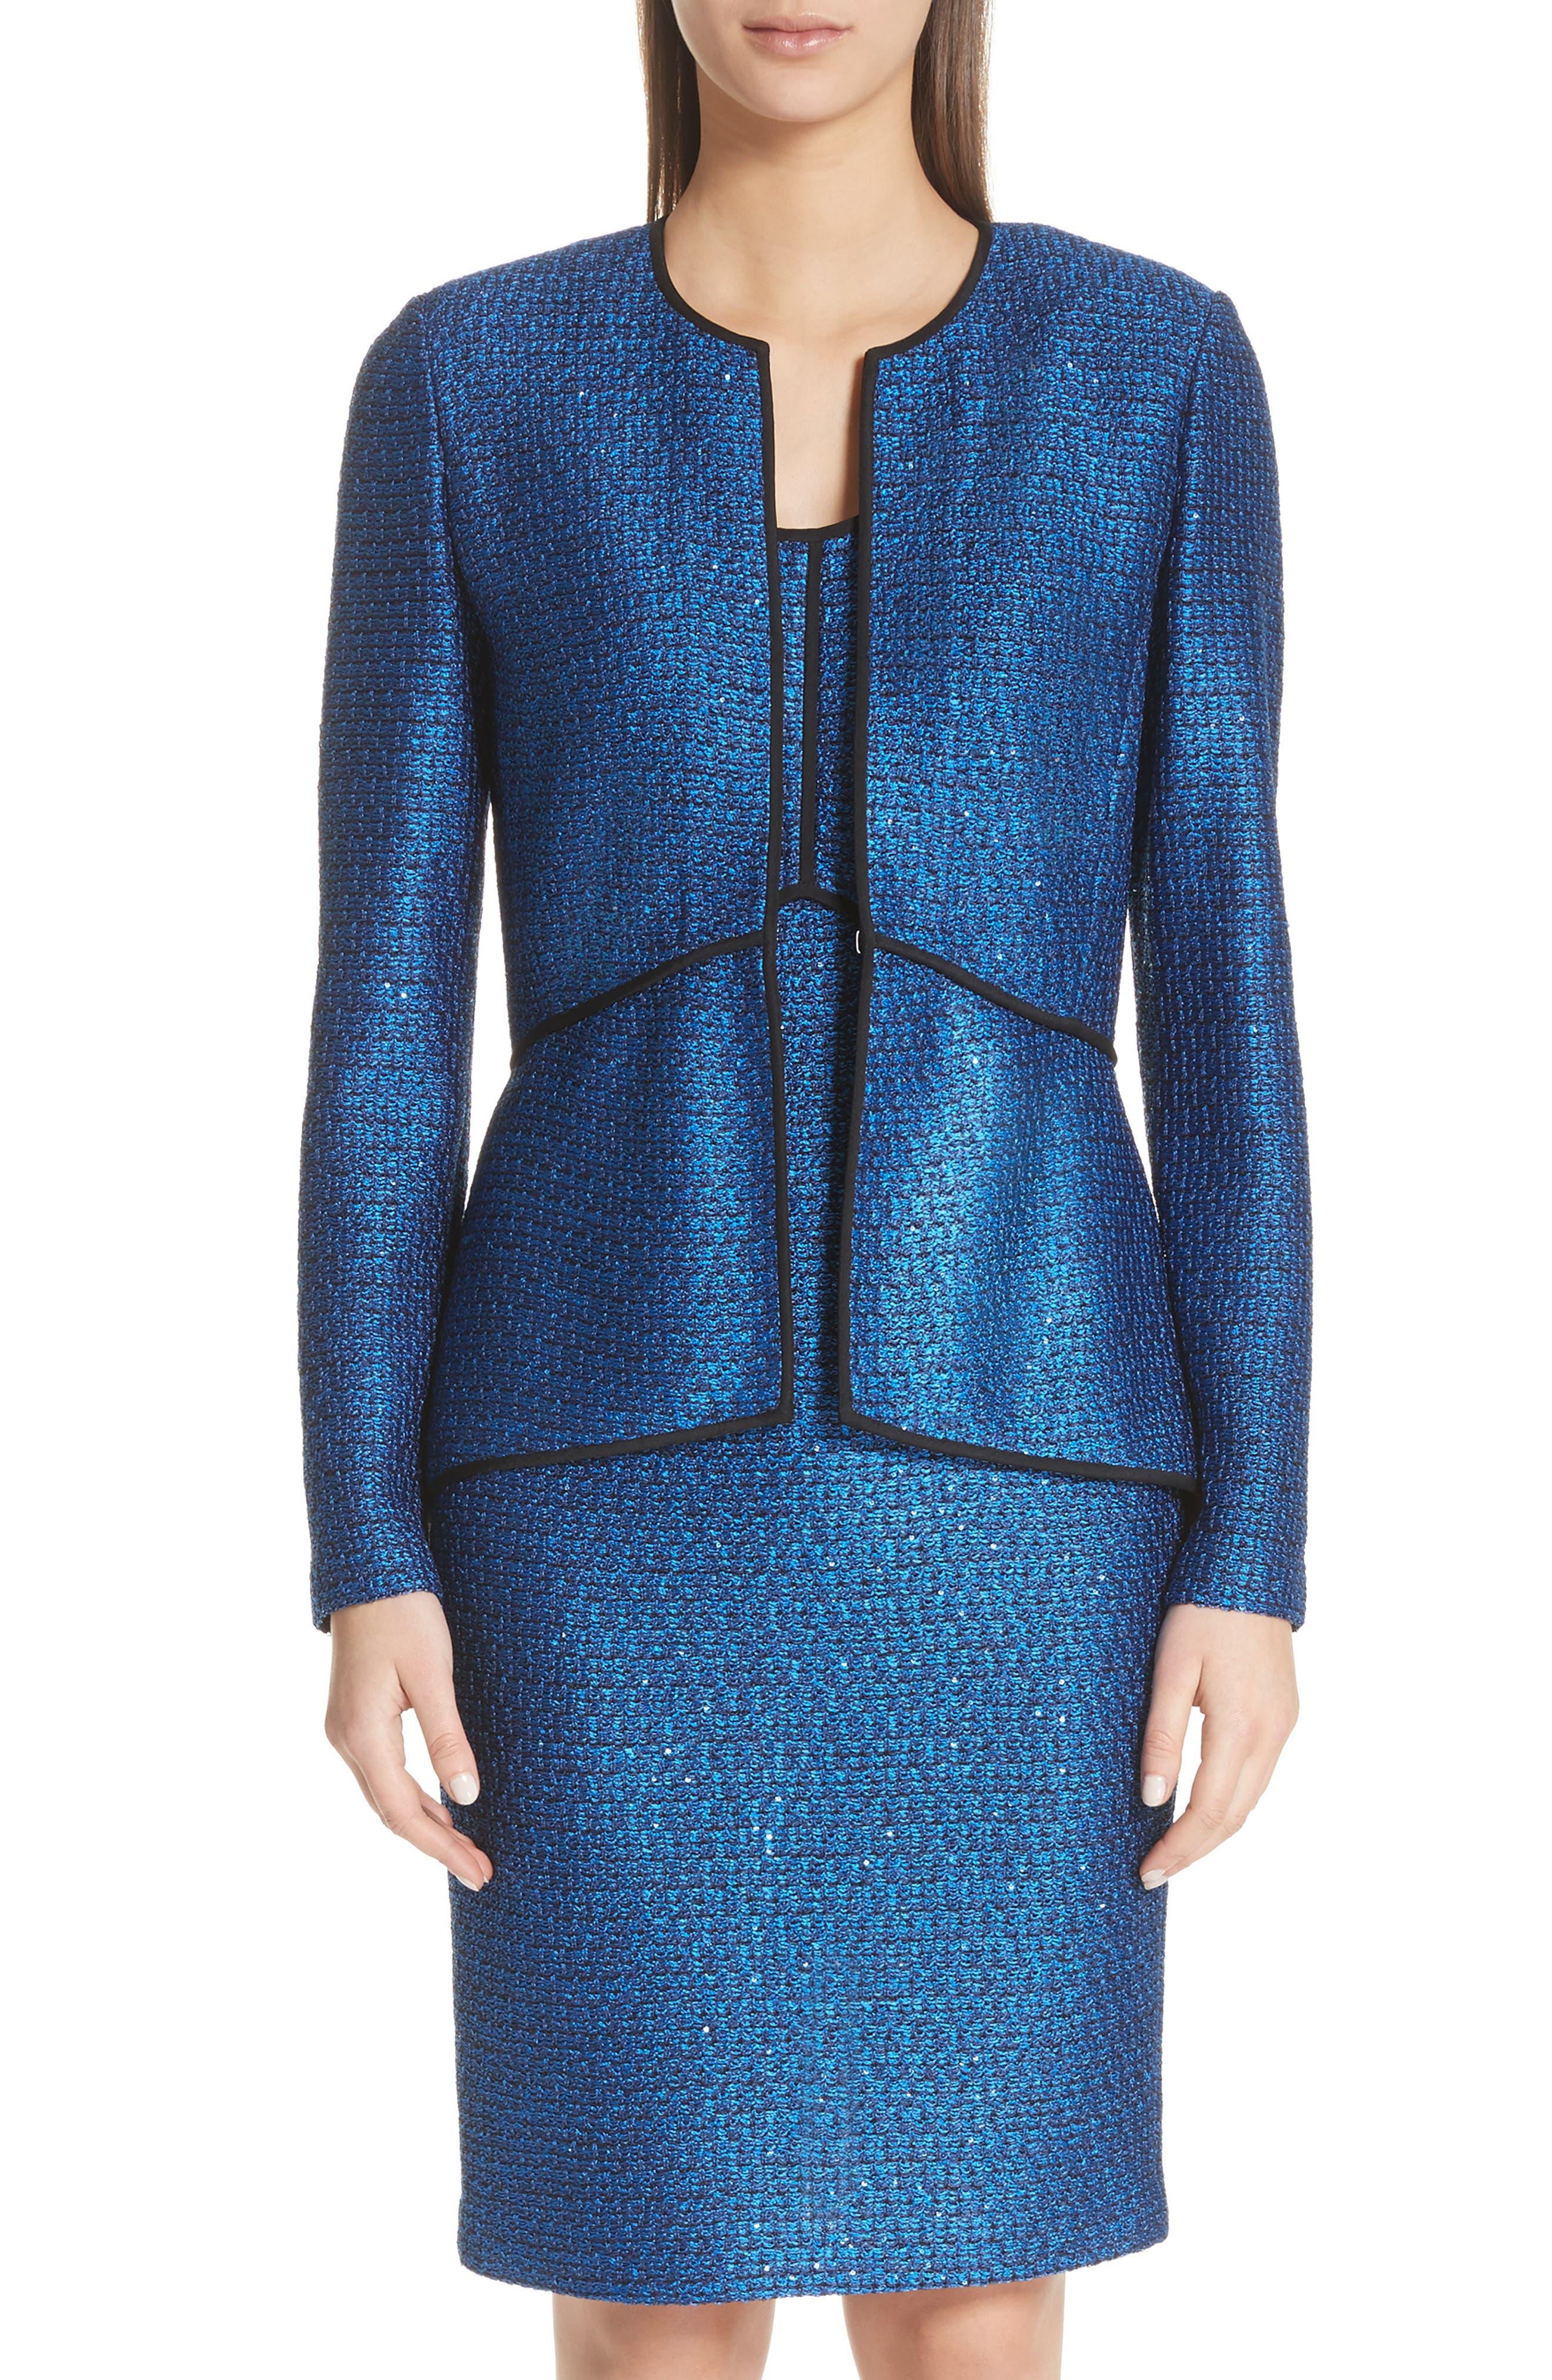 Luster Sequin Knit Jacket,                             Main thumbnail 1, color,                             Cobalt Multi